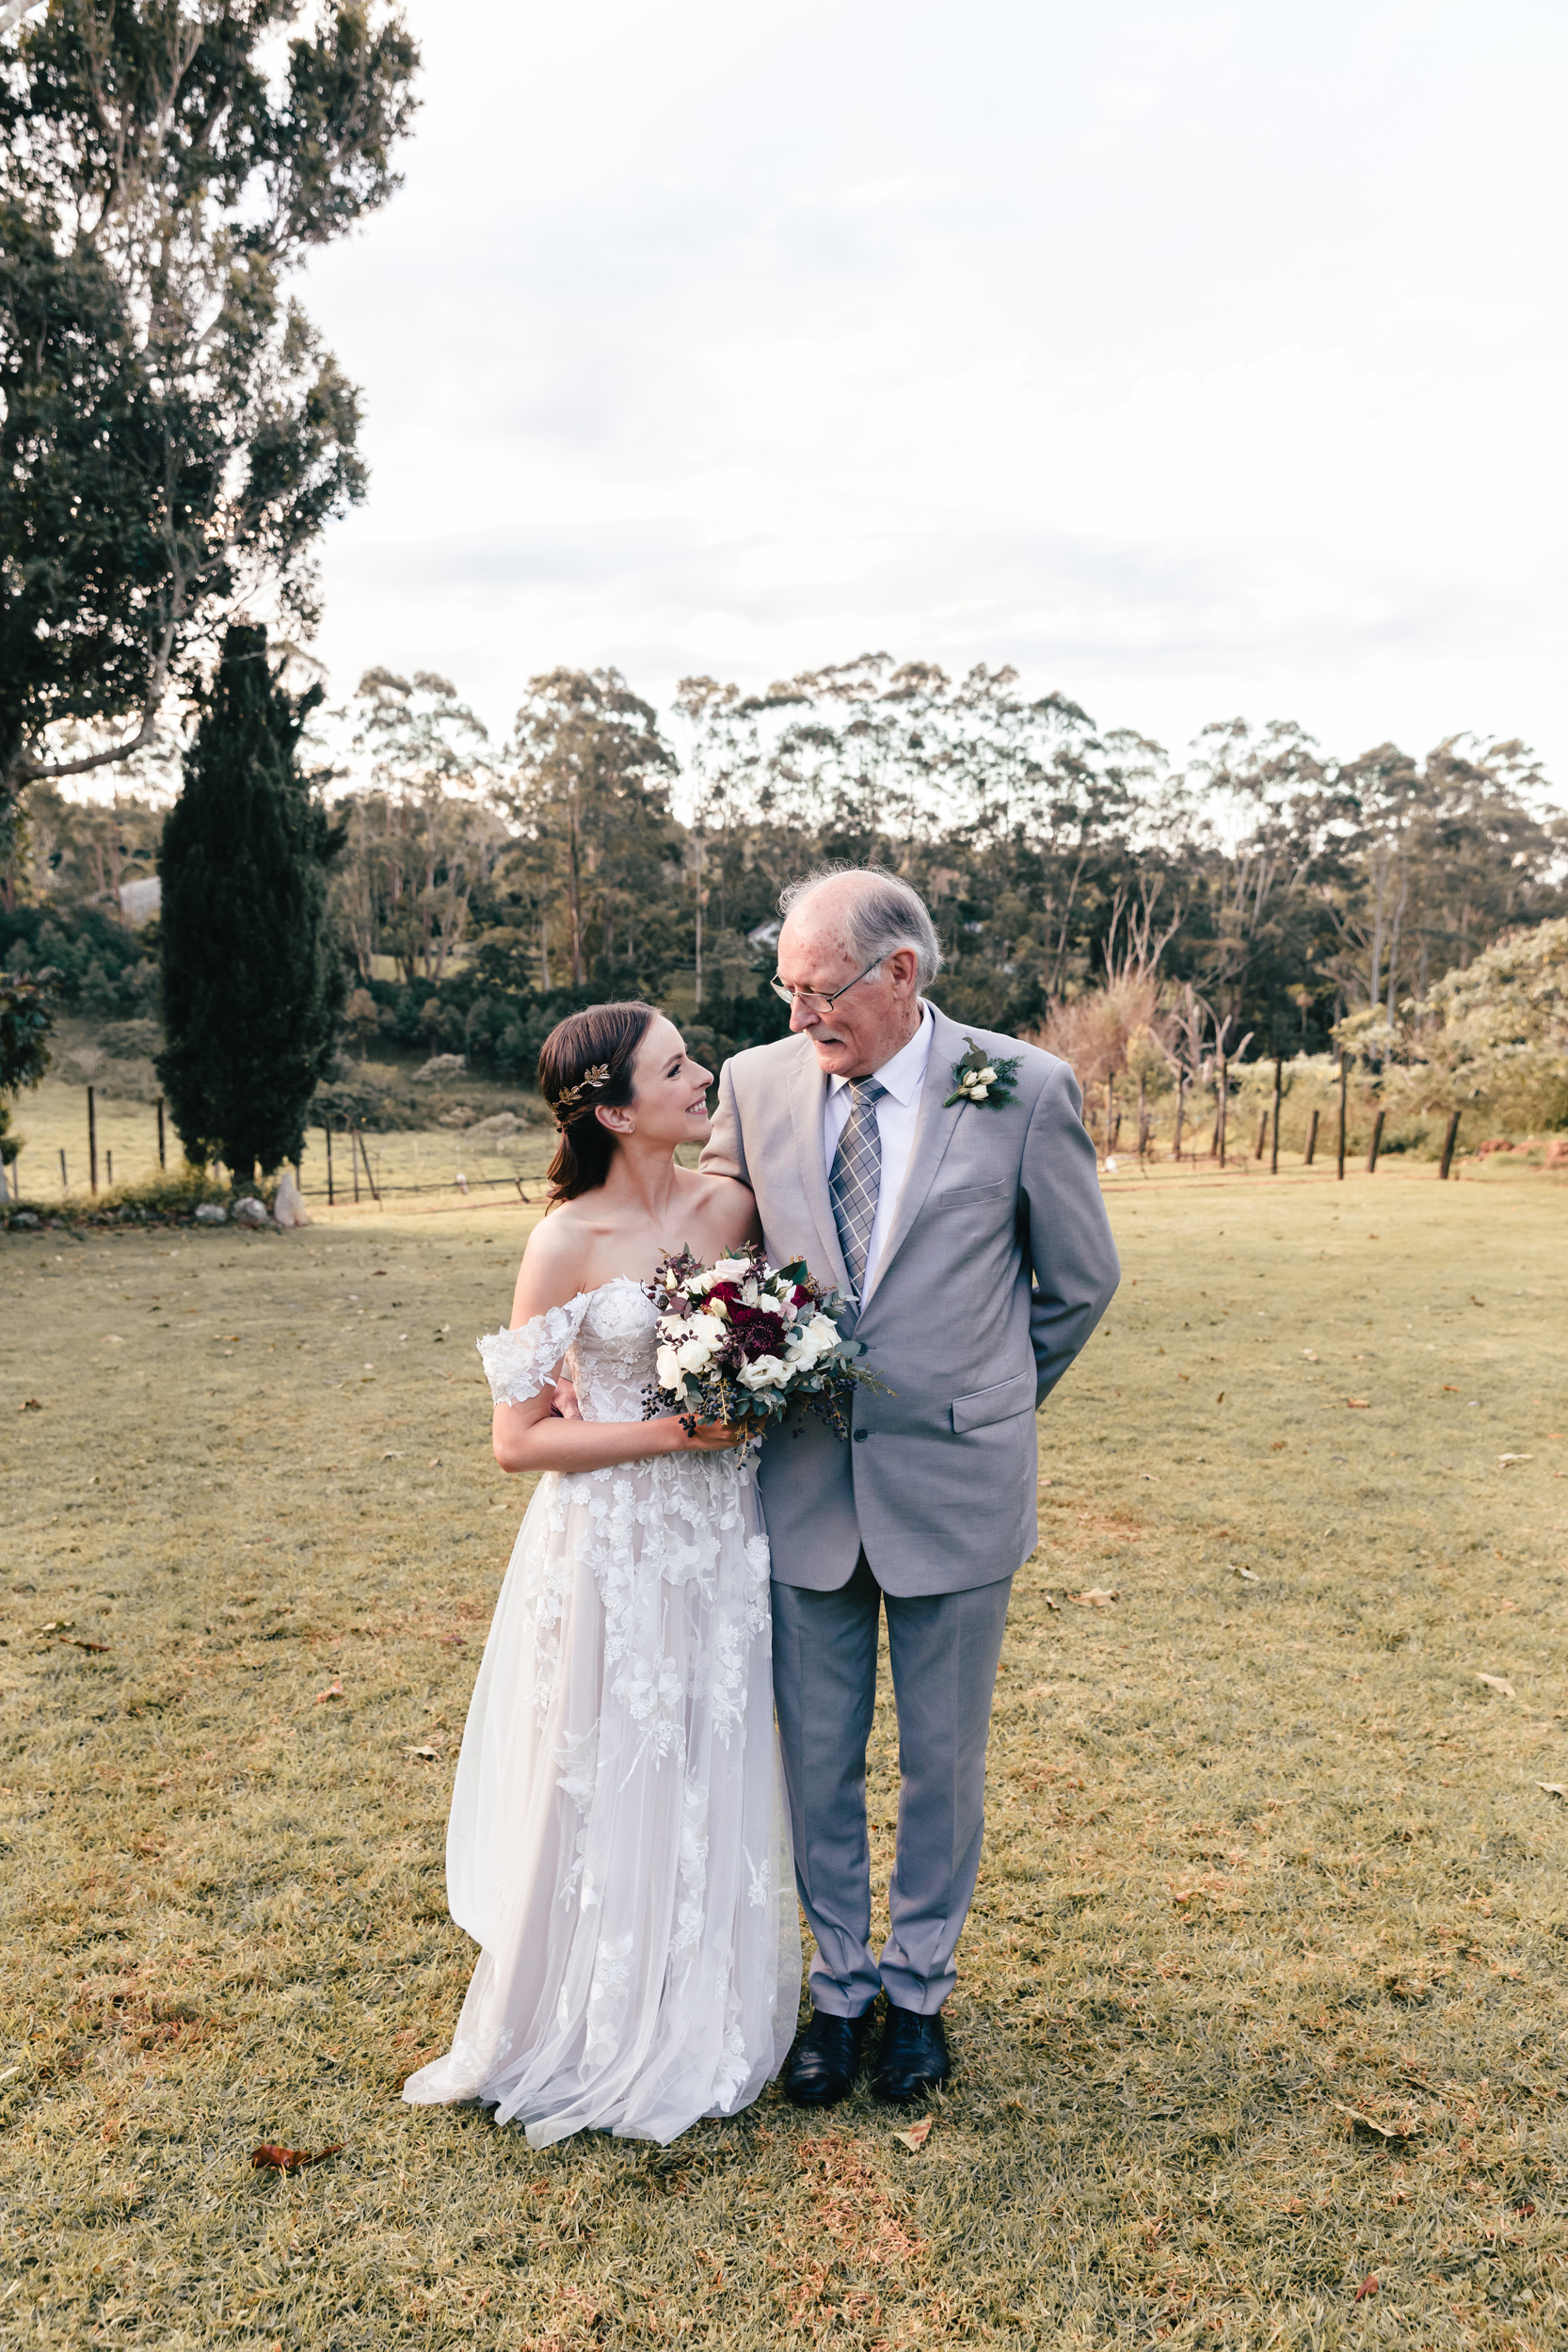 Olivia & Andrew Wedding_Group Photos-49.jpg